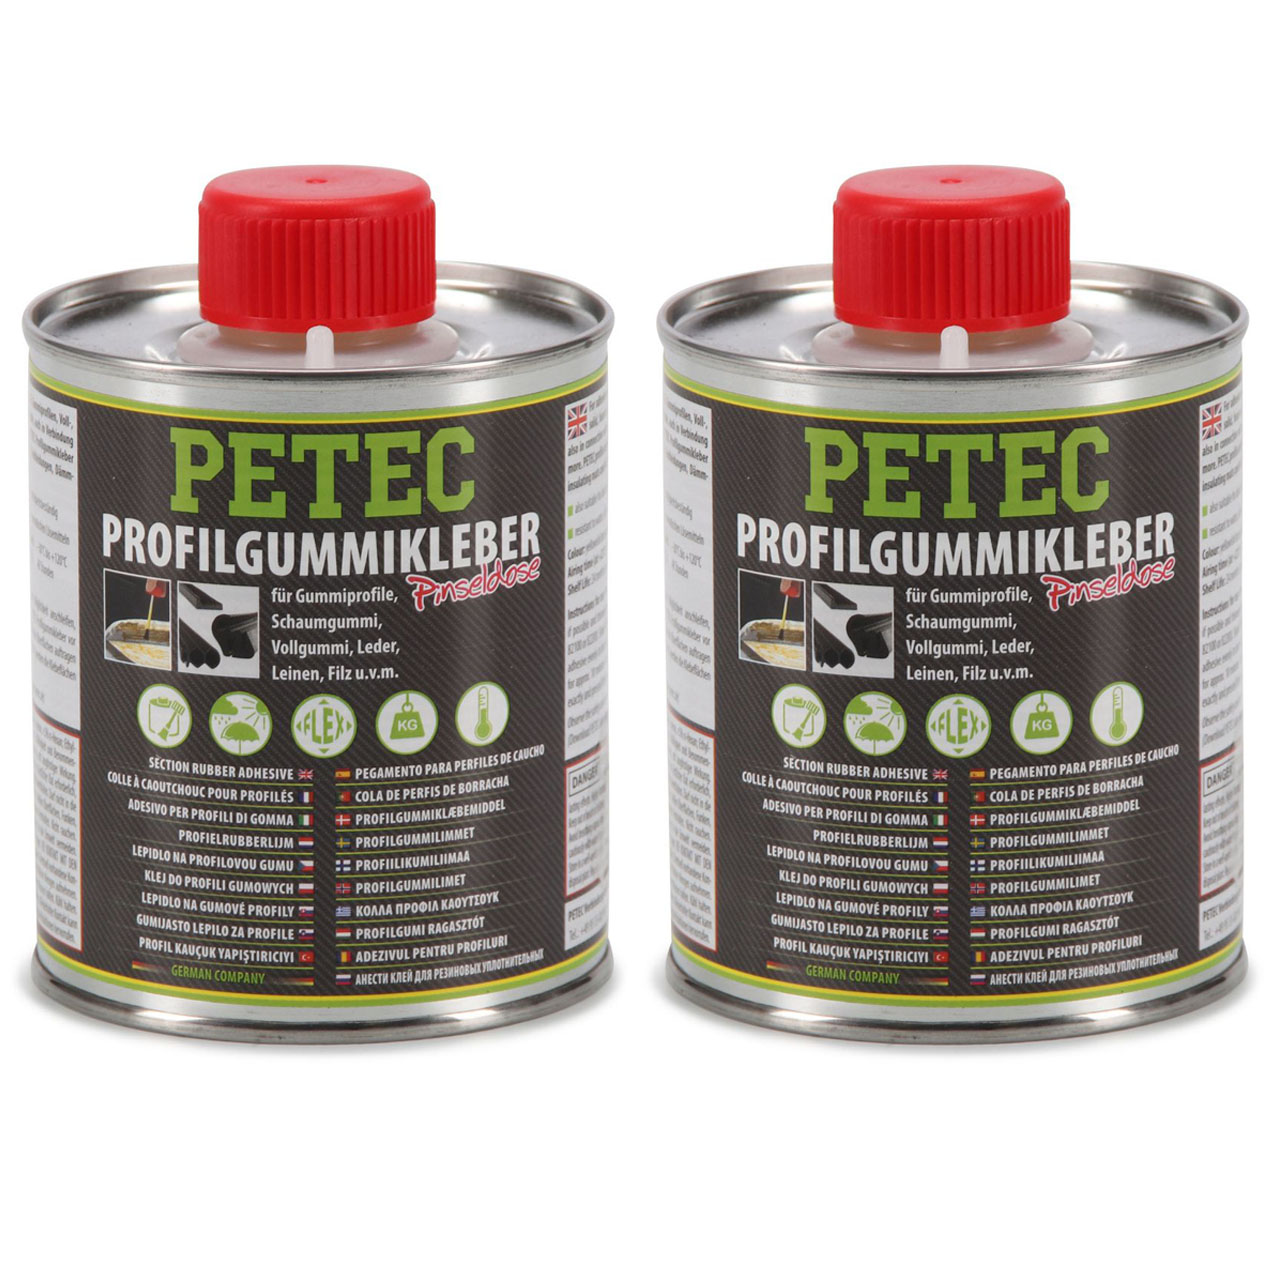 2x 350ml PETEC 9385 Gummiklebstoff Profilgummikleber Pinseldose GELB-TRANSPARENT